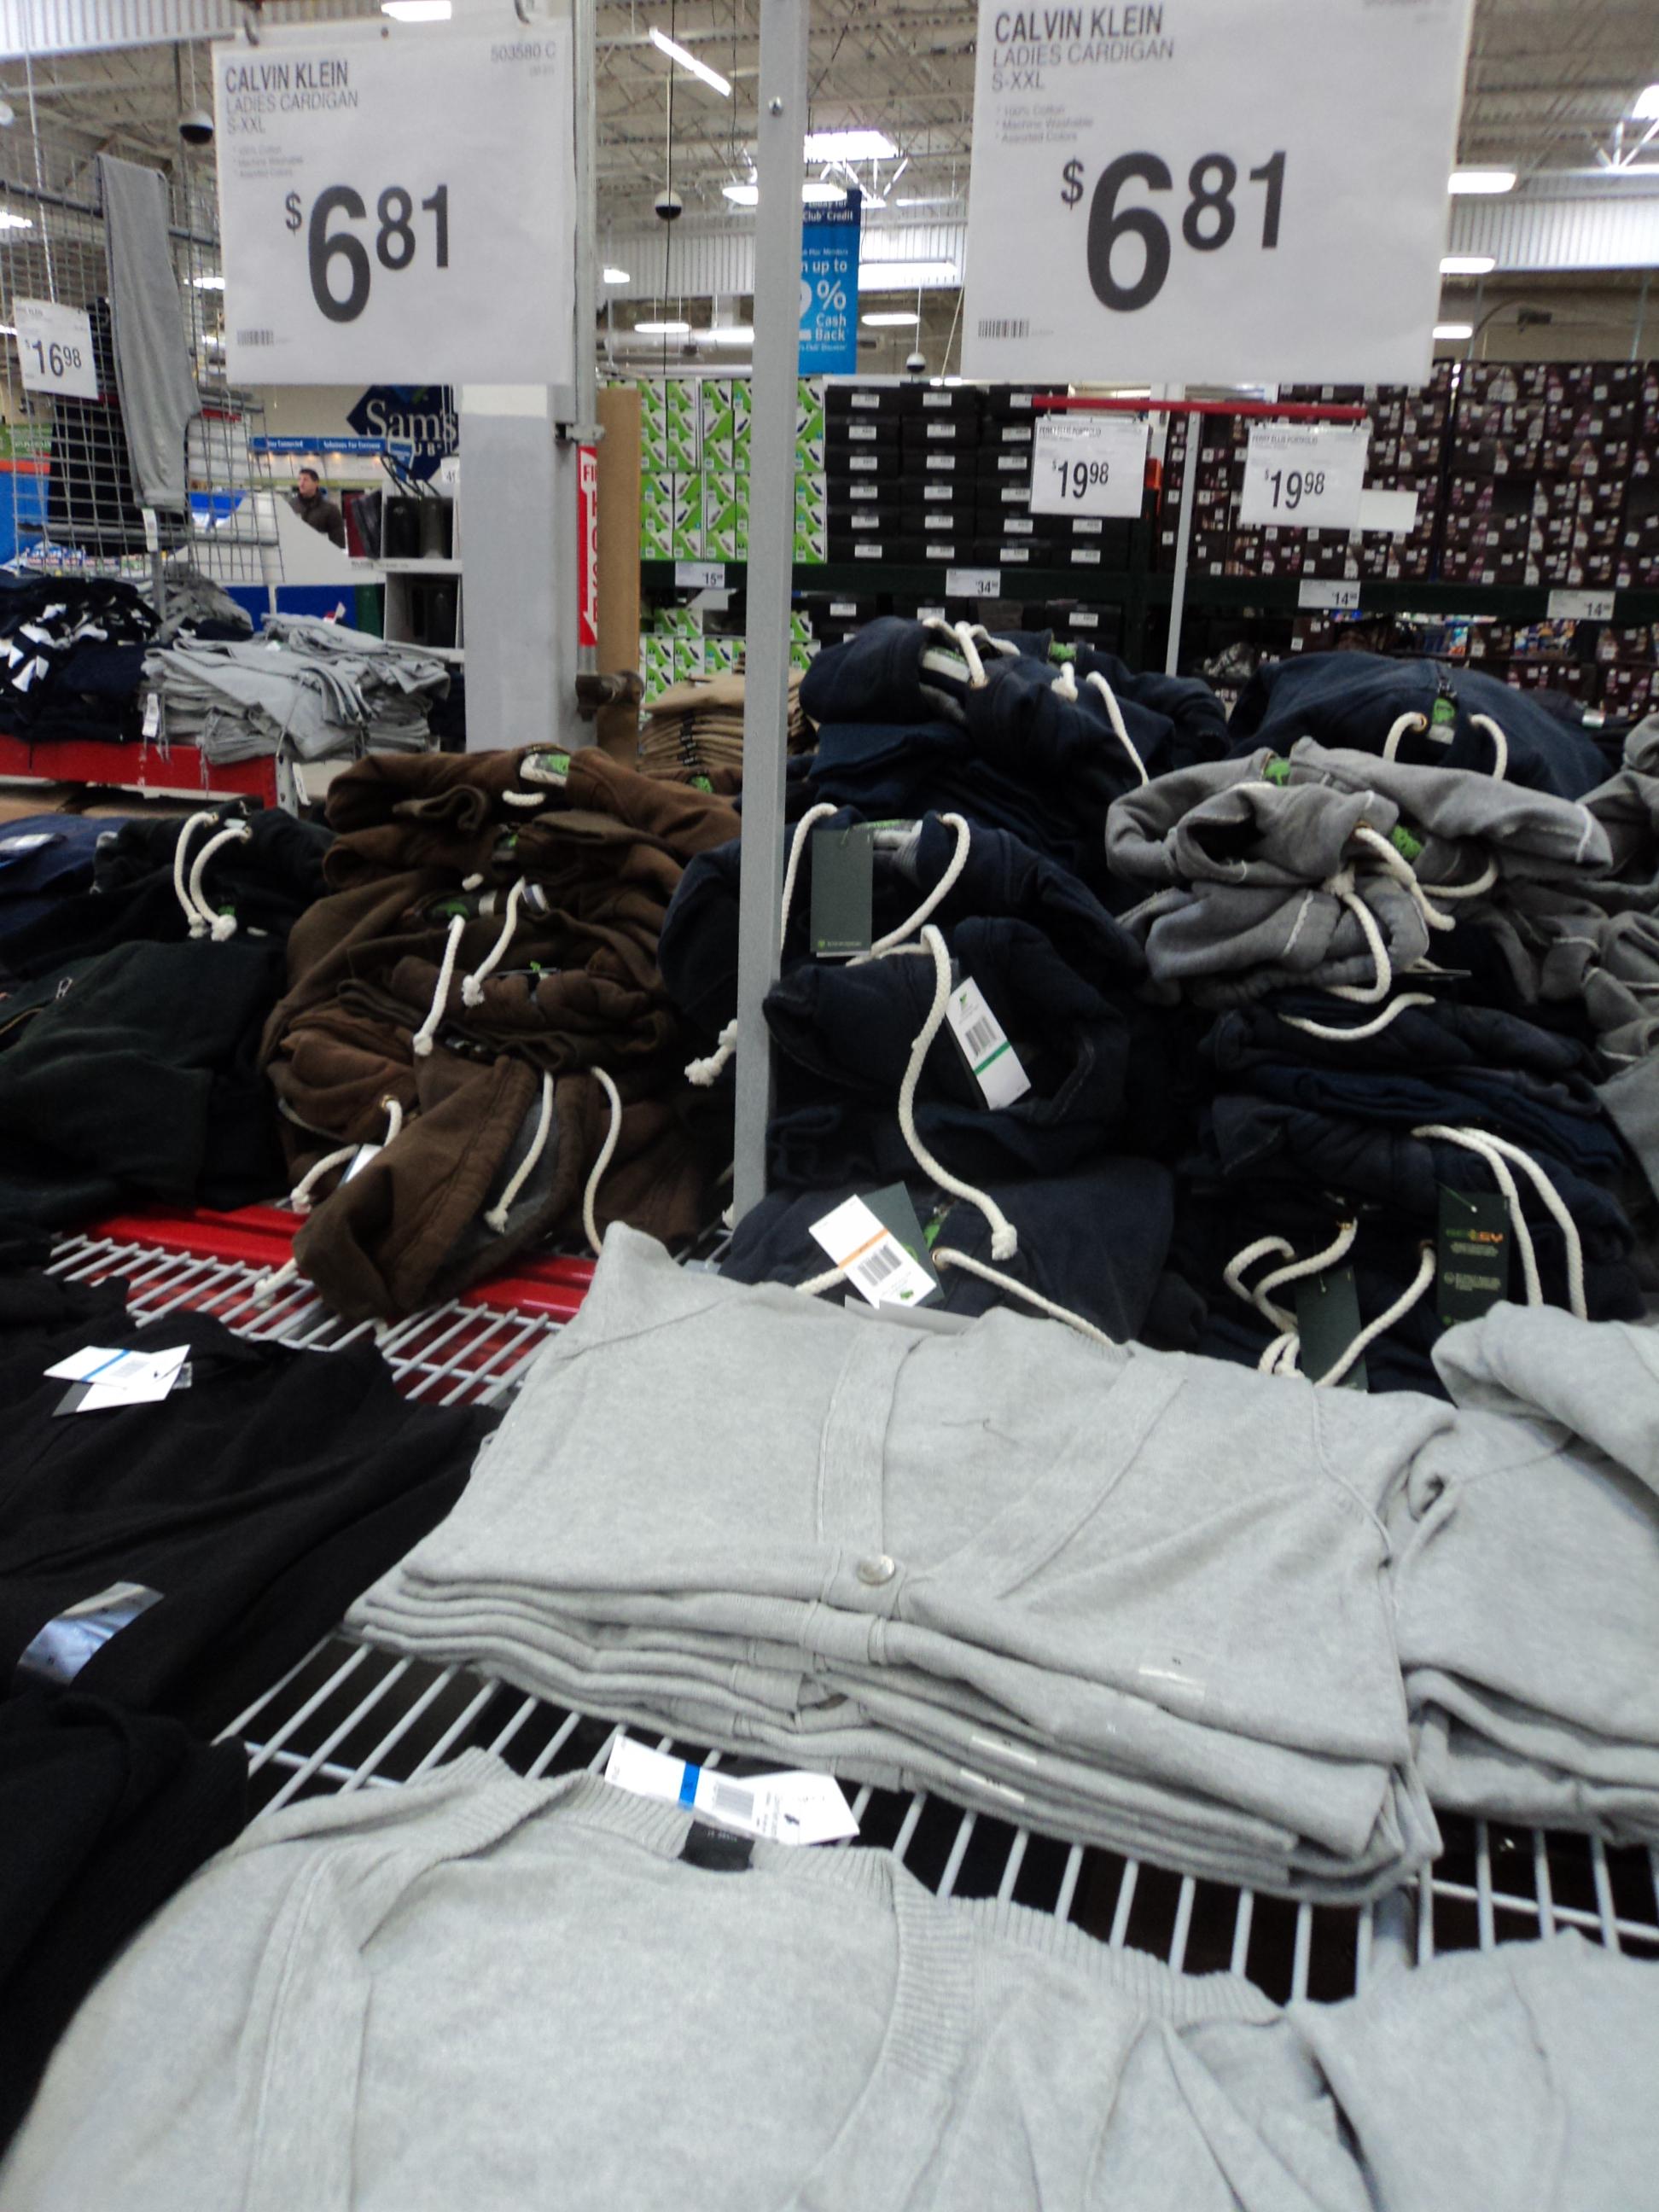 1ba34c37d67 sam s wholesale club online ordering - Ecosia